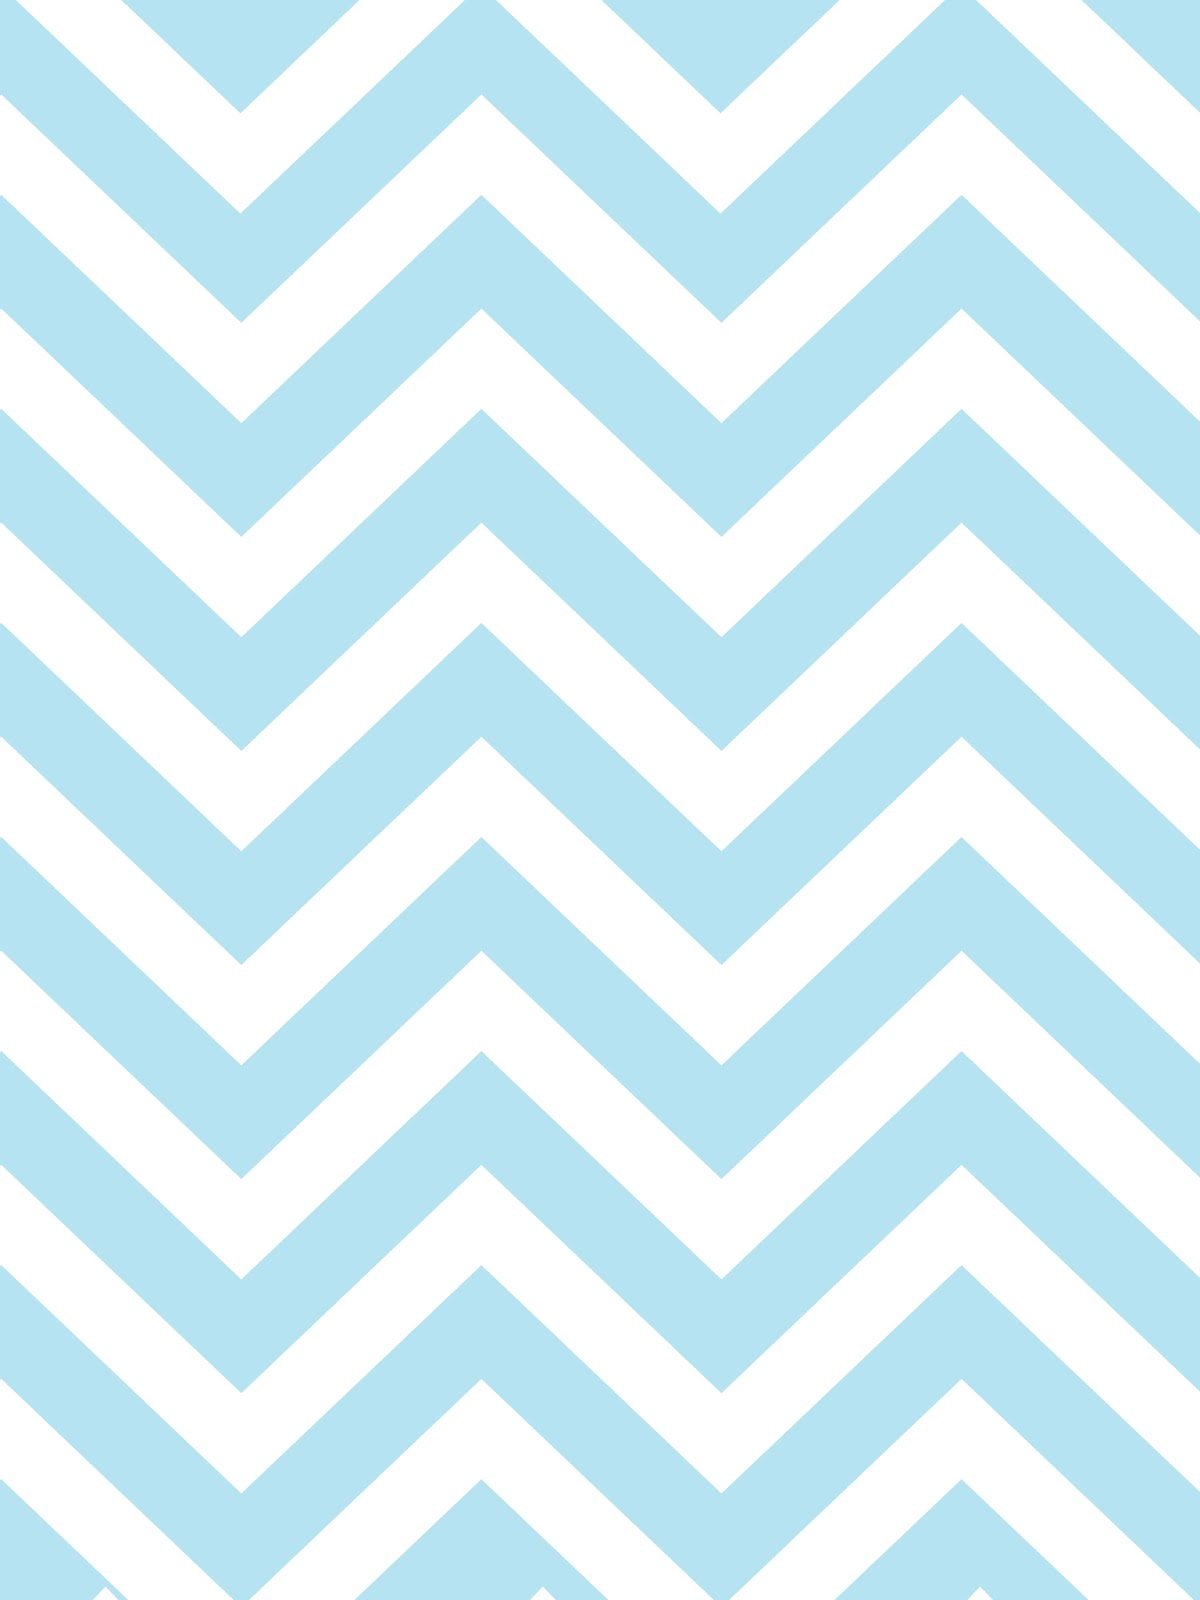 julesoca blog chevron gray pink baby blue sand